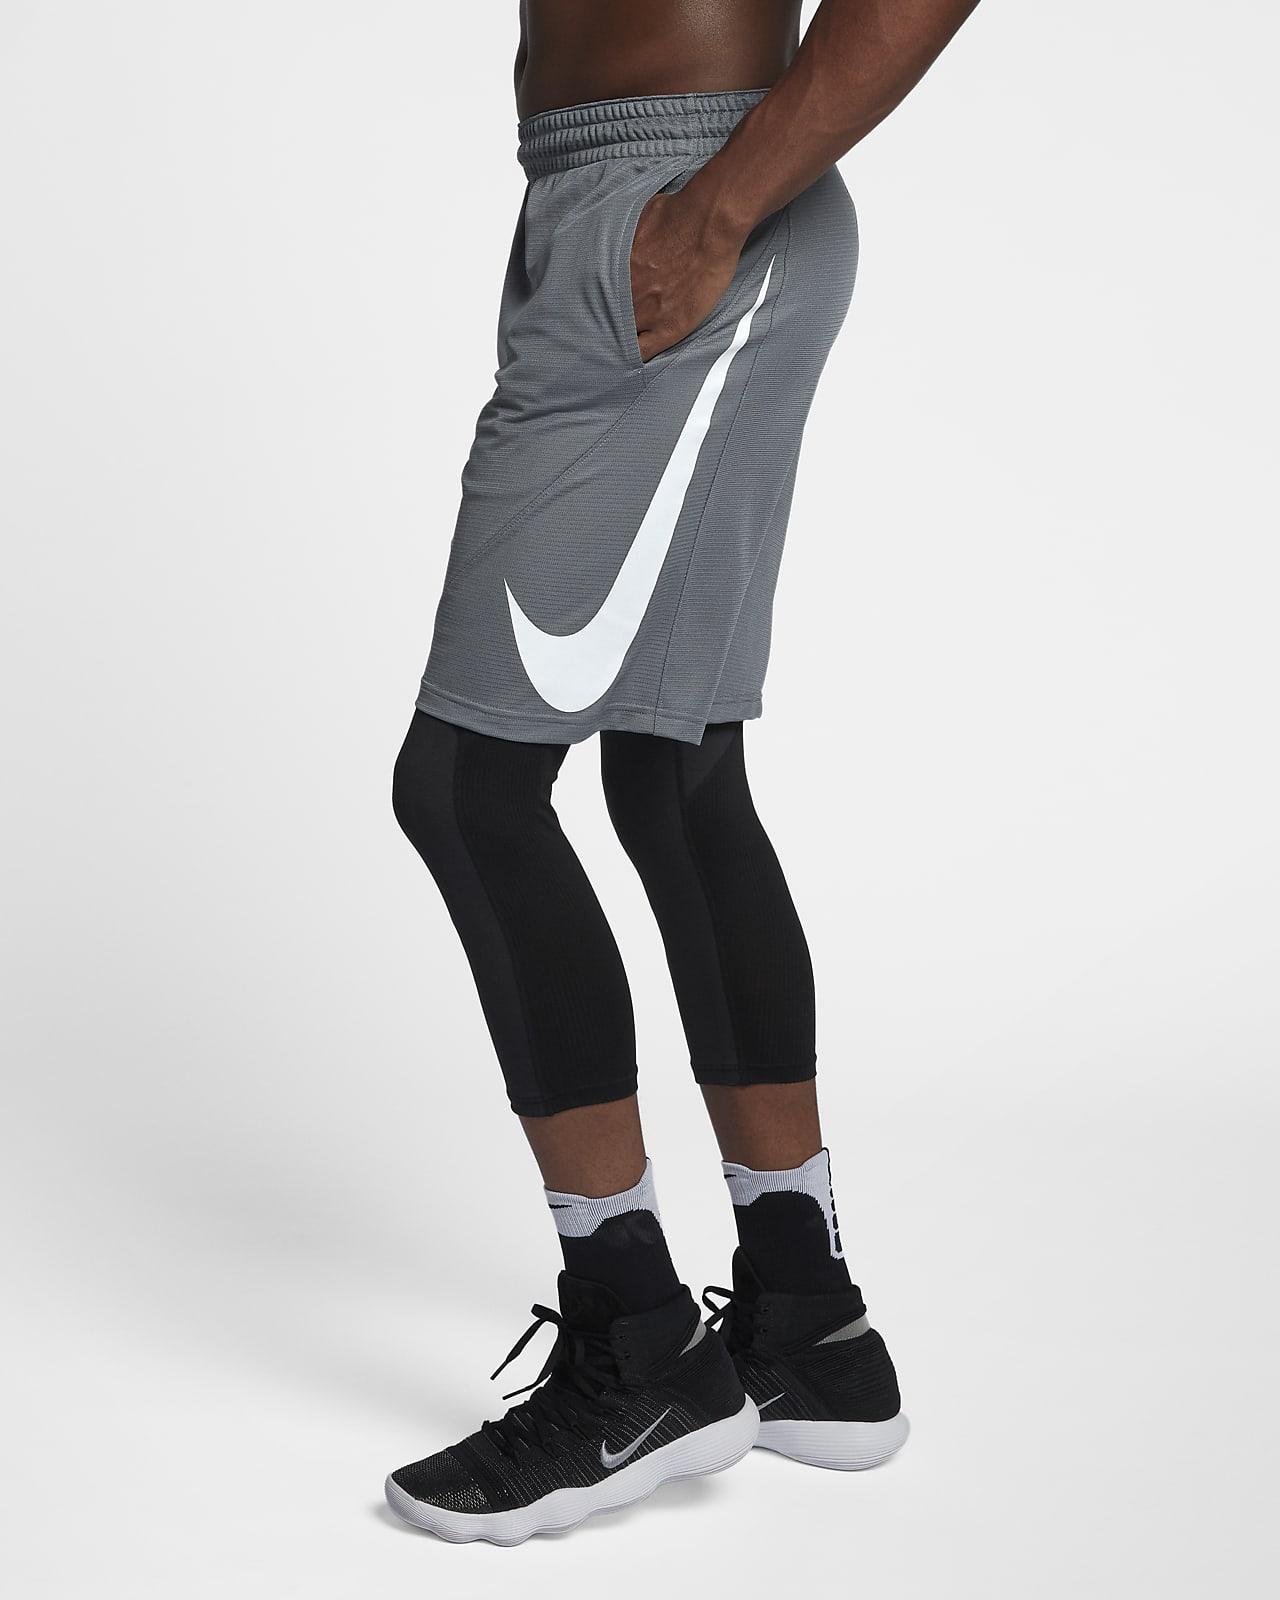 Nike HBR Men's Basketball Shorts